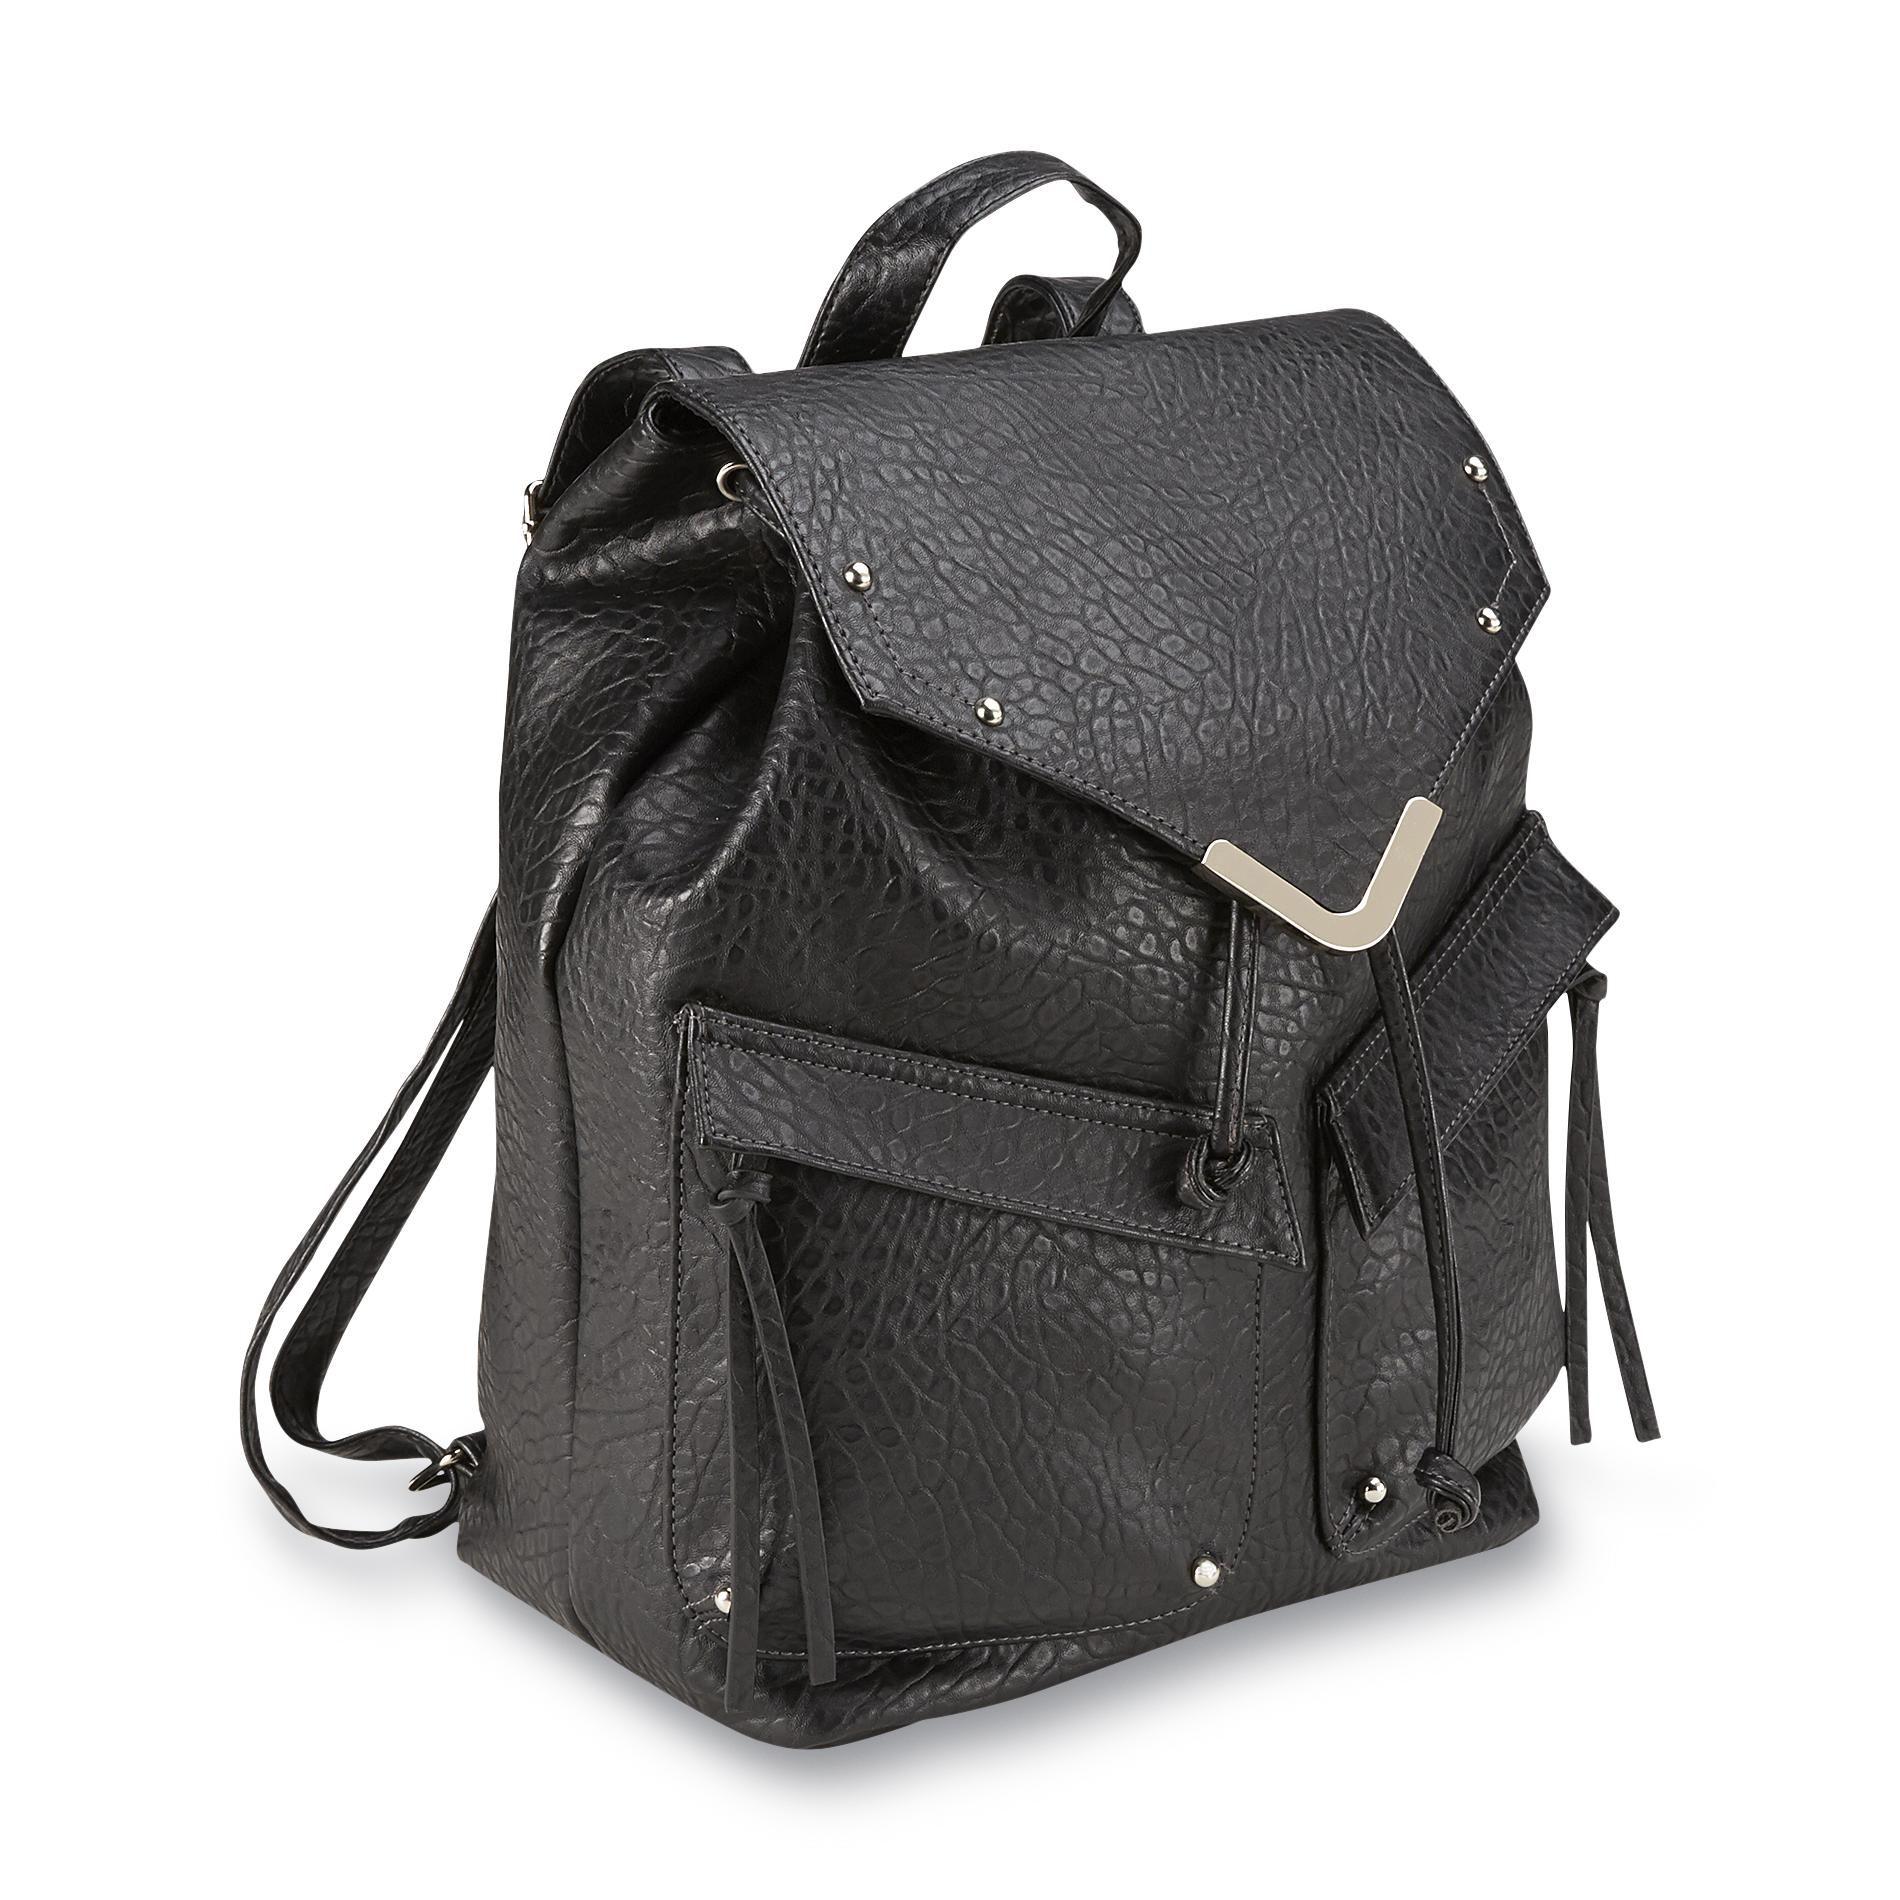 Women's Lucia Backpack Handbag - Kmart   Bag Lady